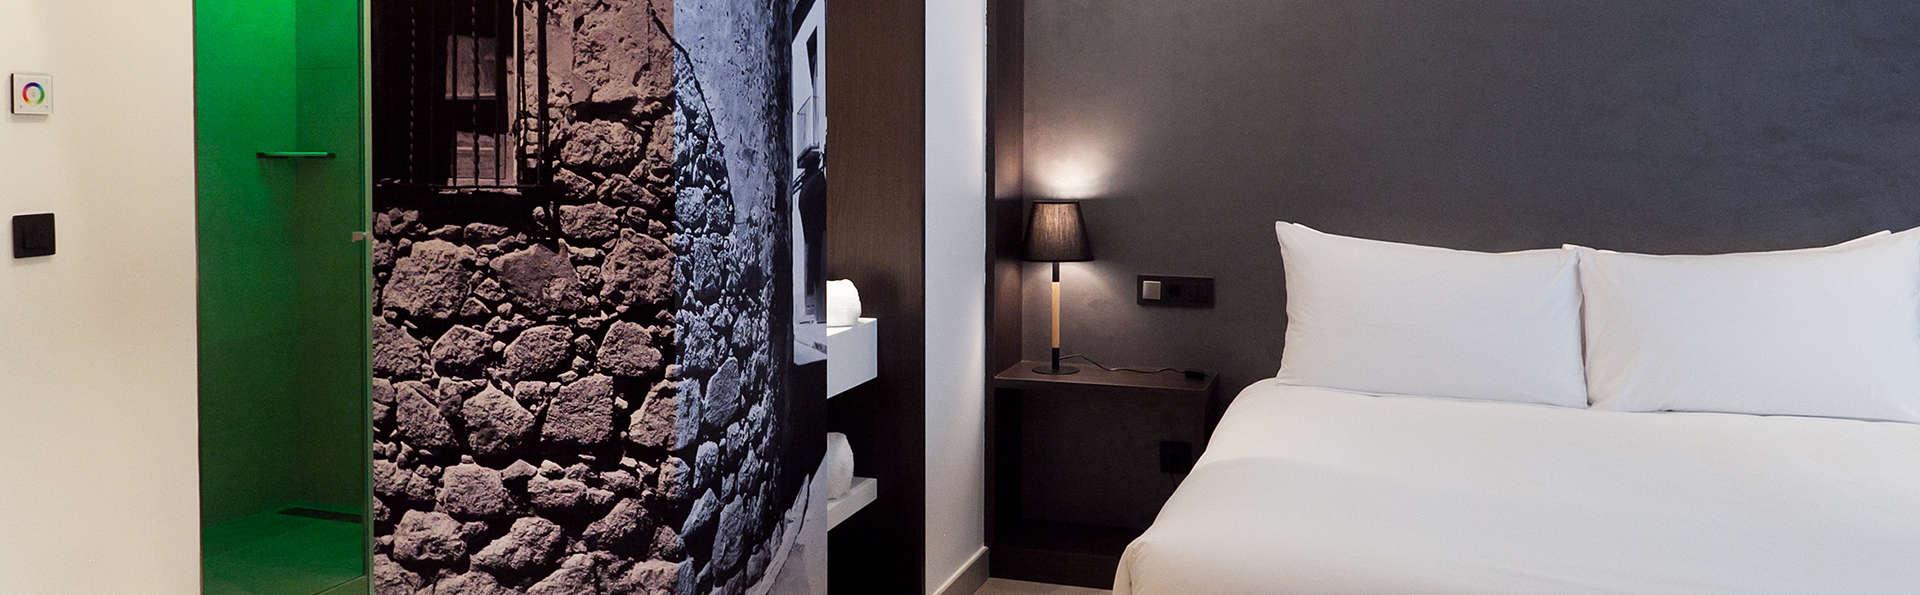 Fuga romantica ad Arenys de Mar in un hotel boutique